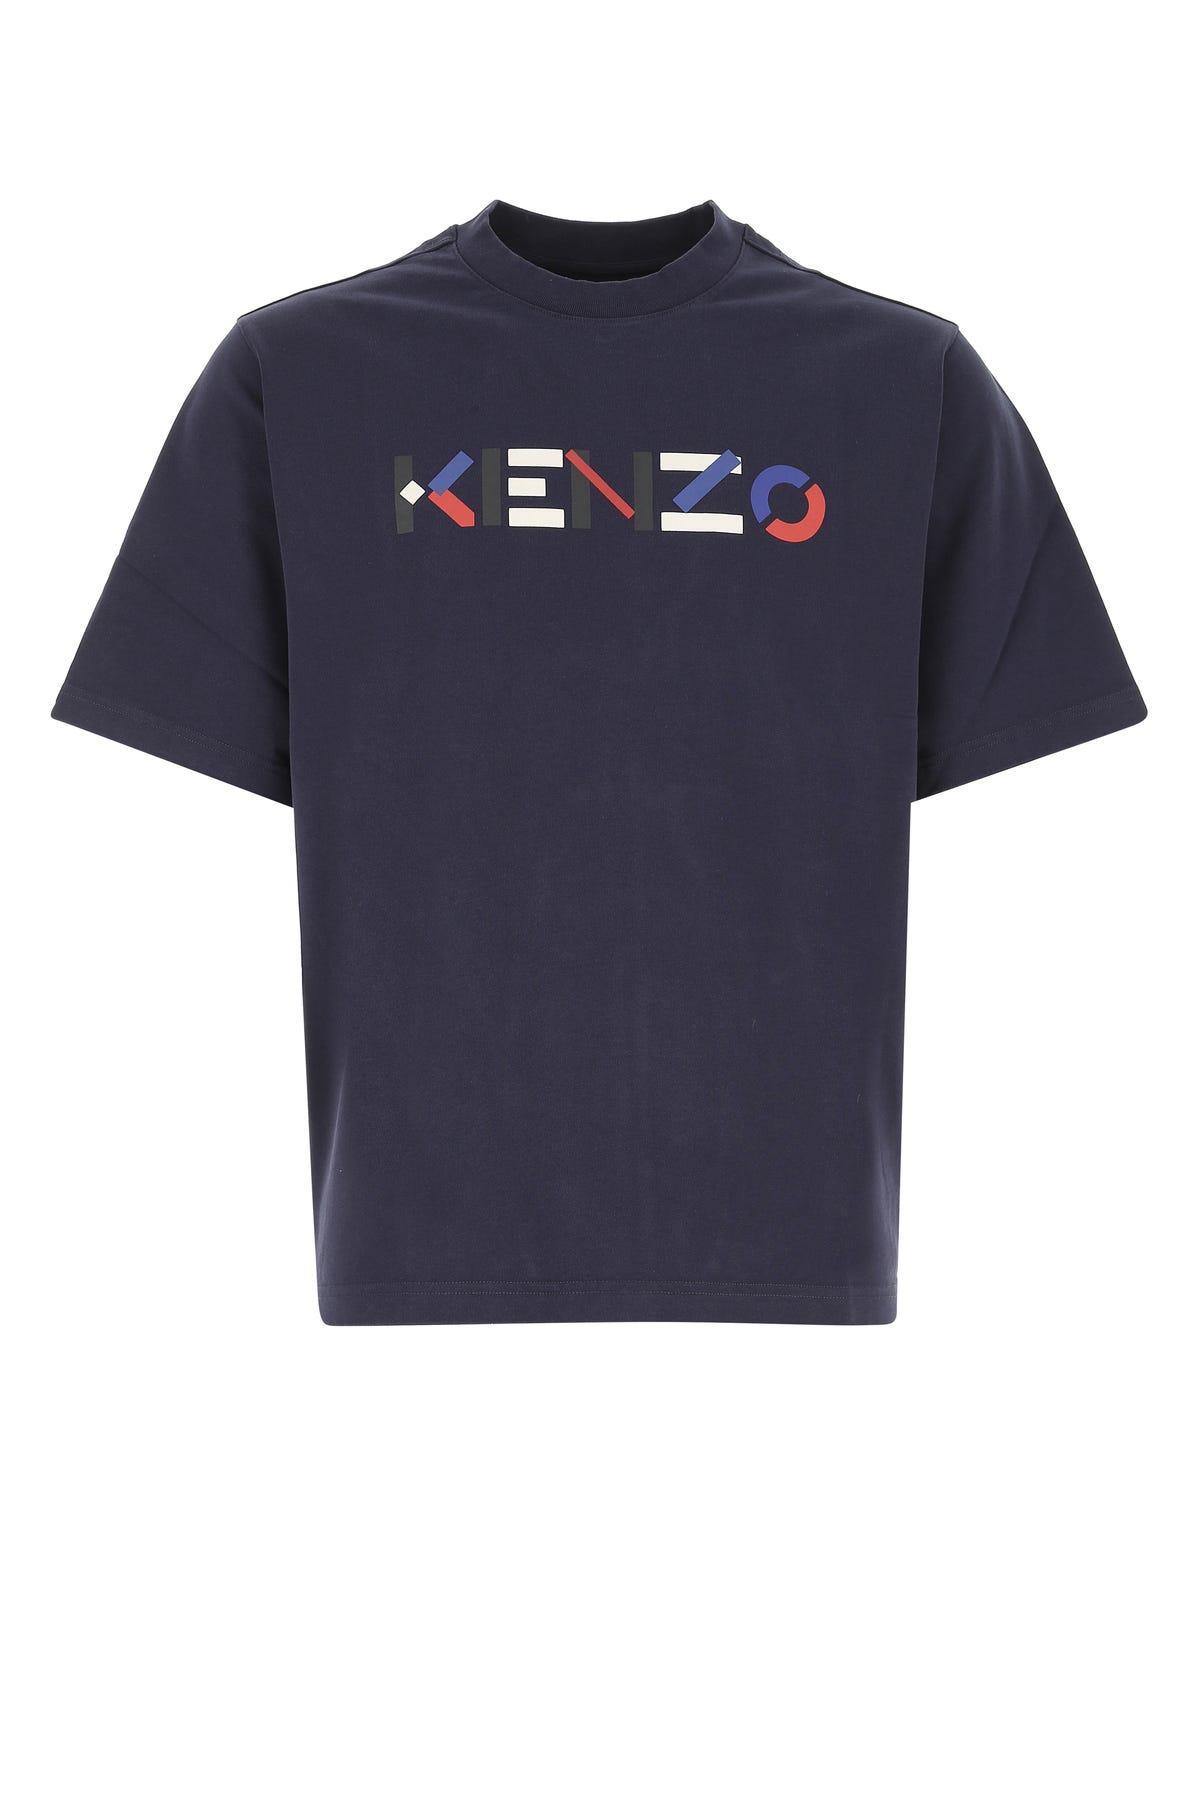 Kenzo Logo T-shirt In Navy